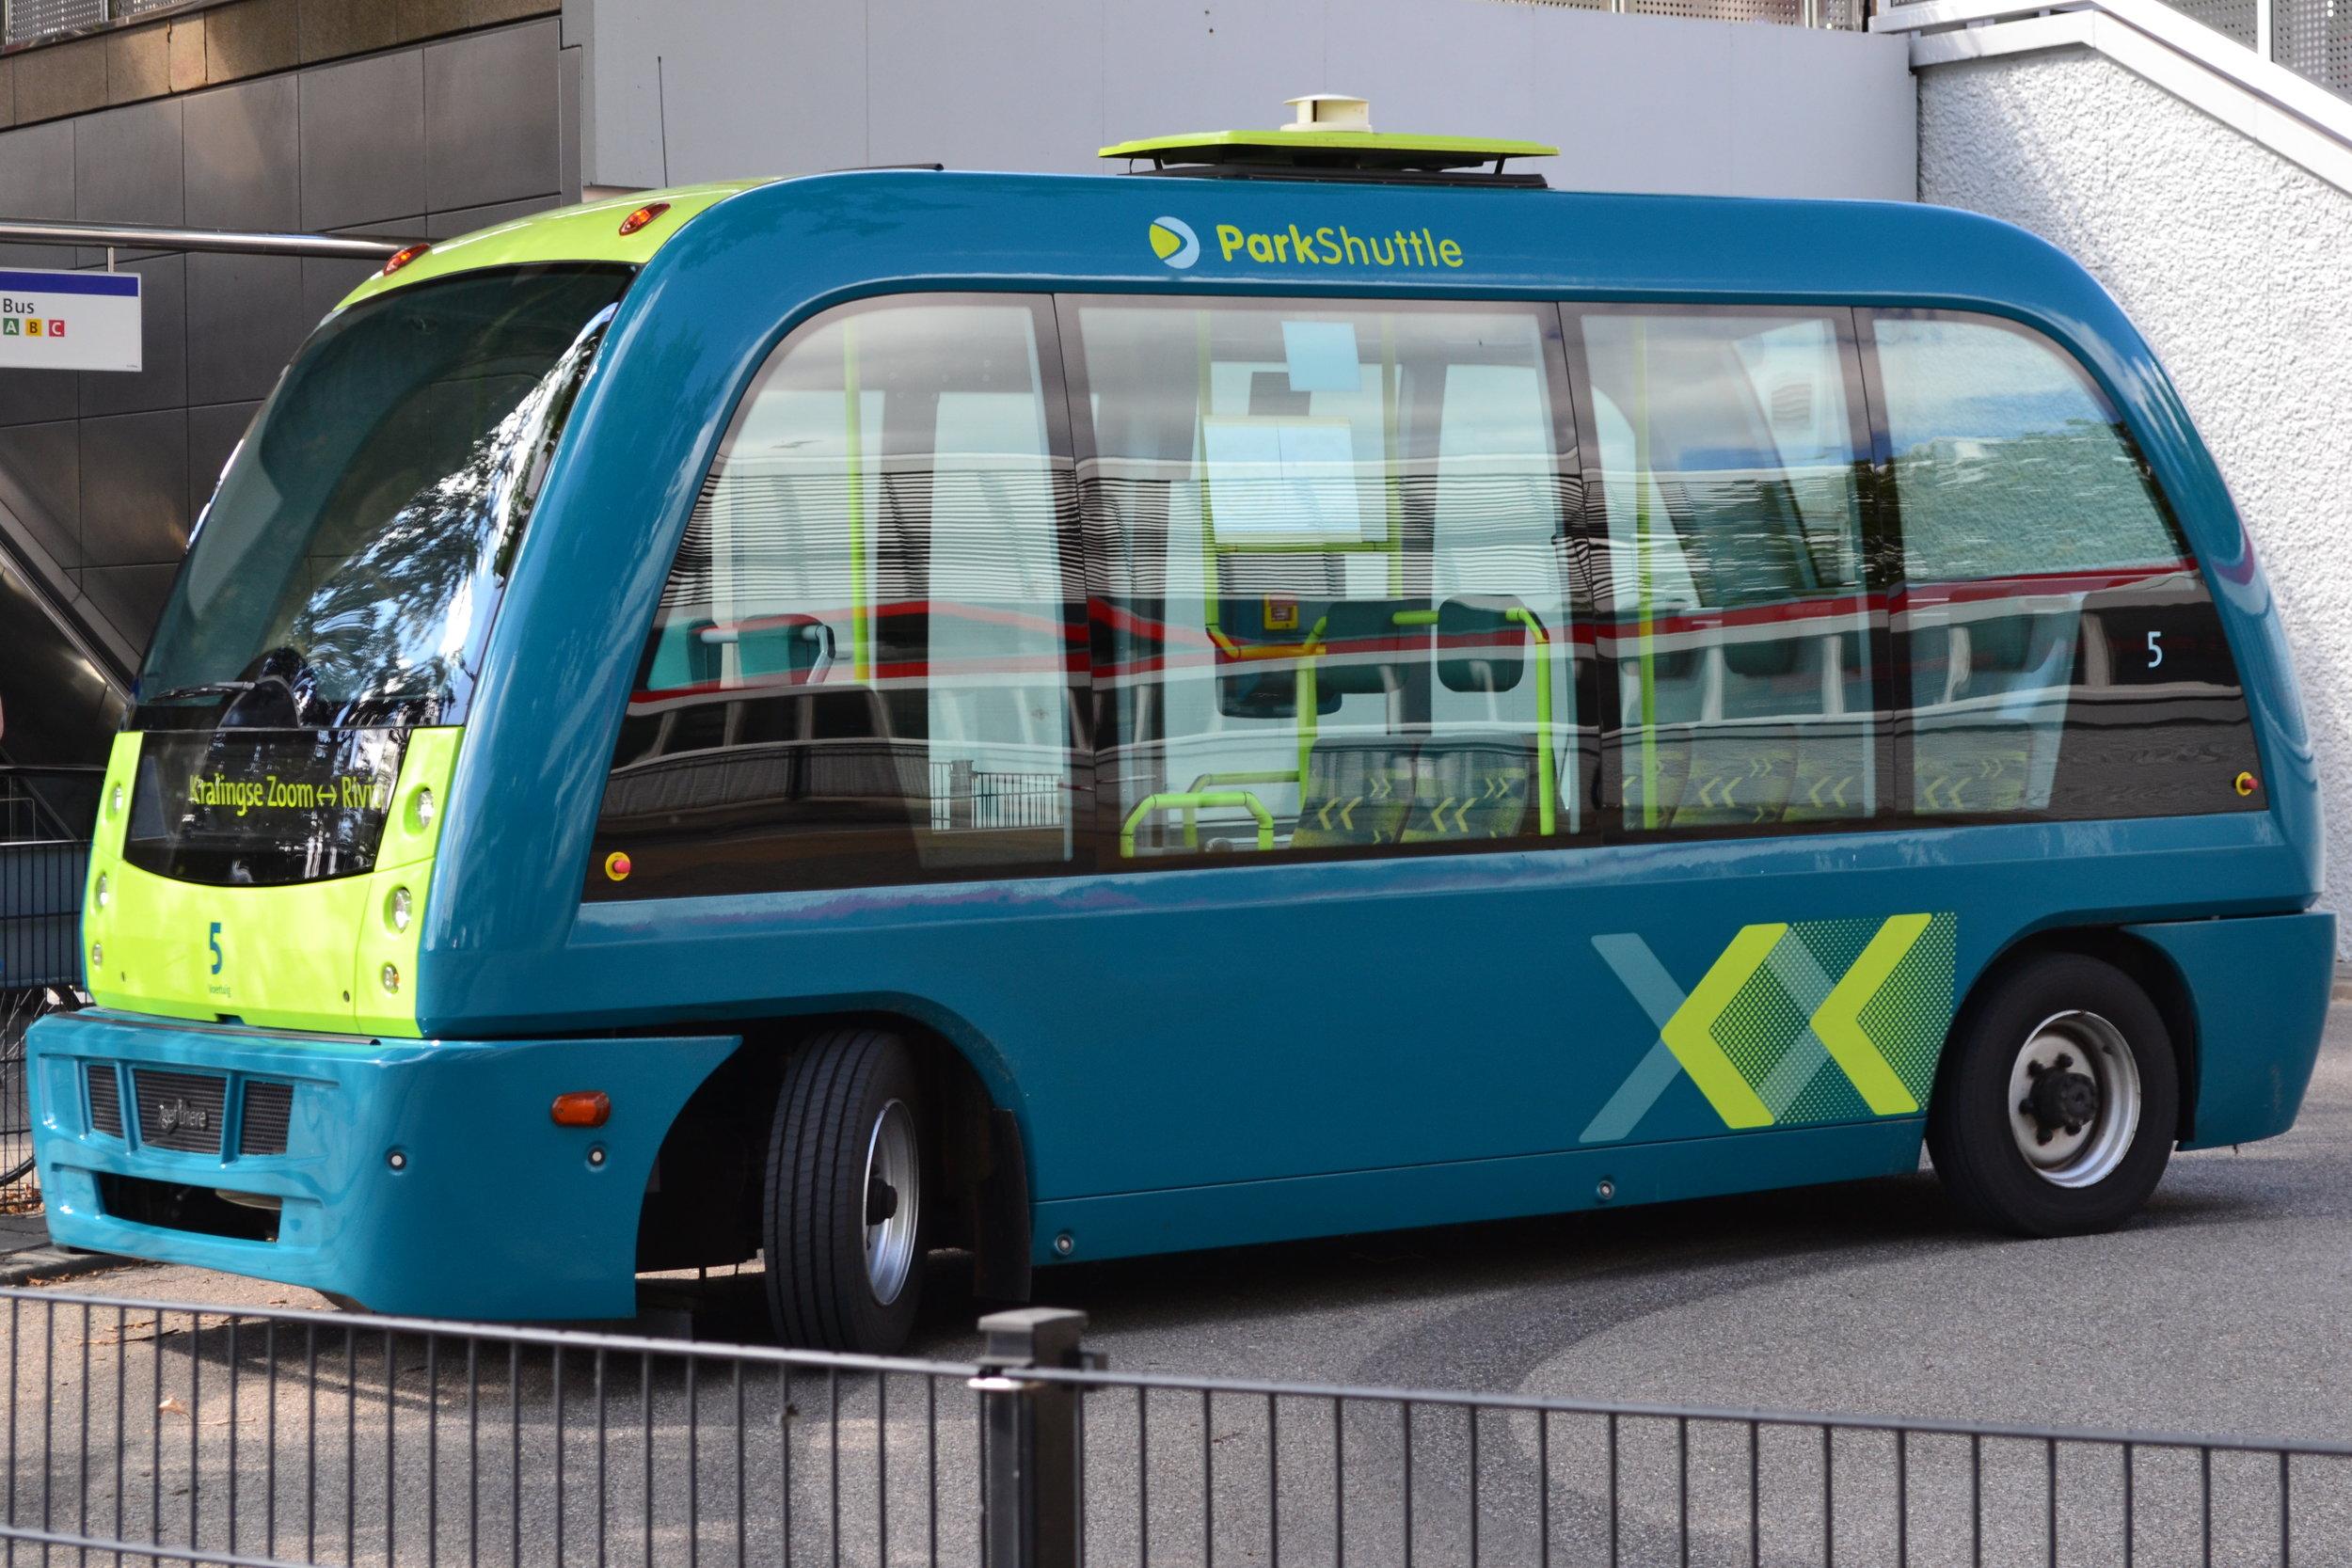 Rotterdam ParkShuttle autonomous minibuses (Photo credit: Paradasos)